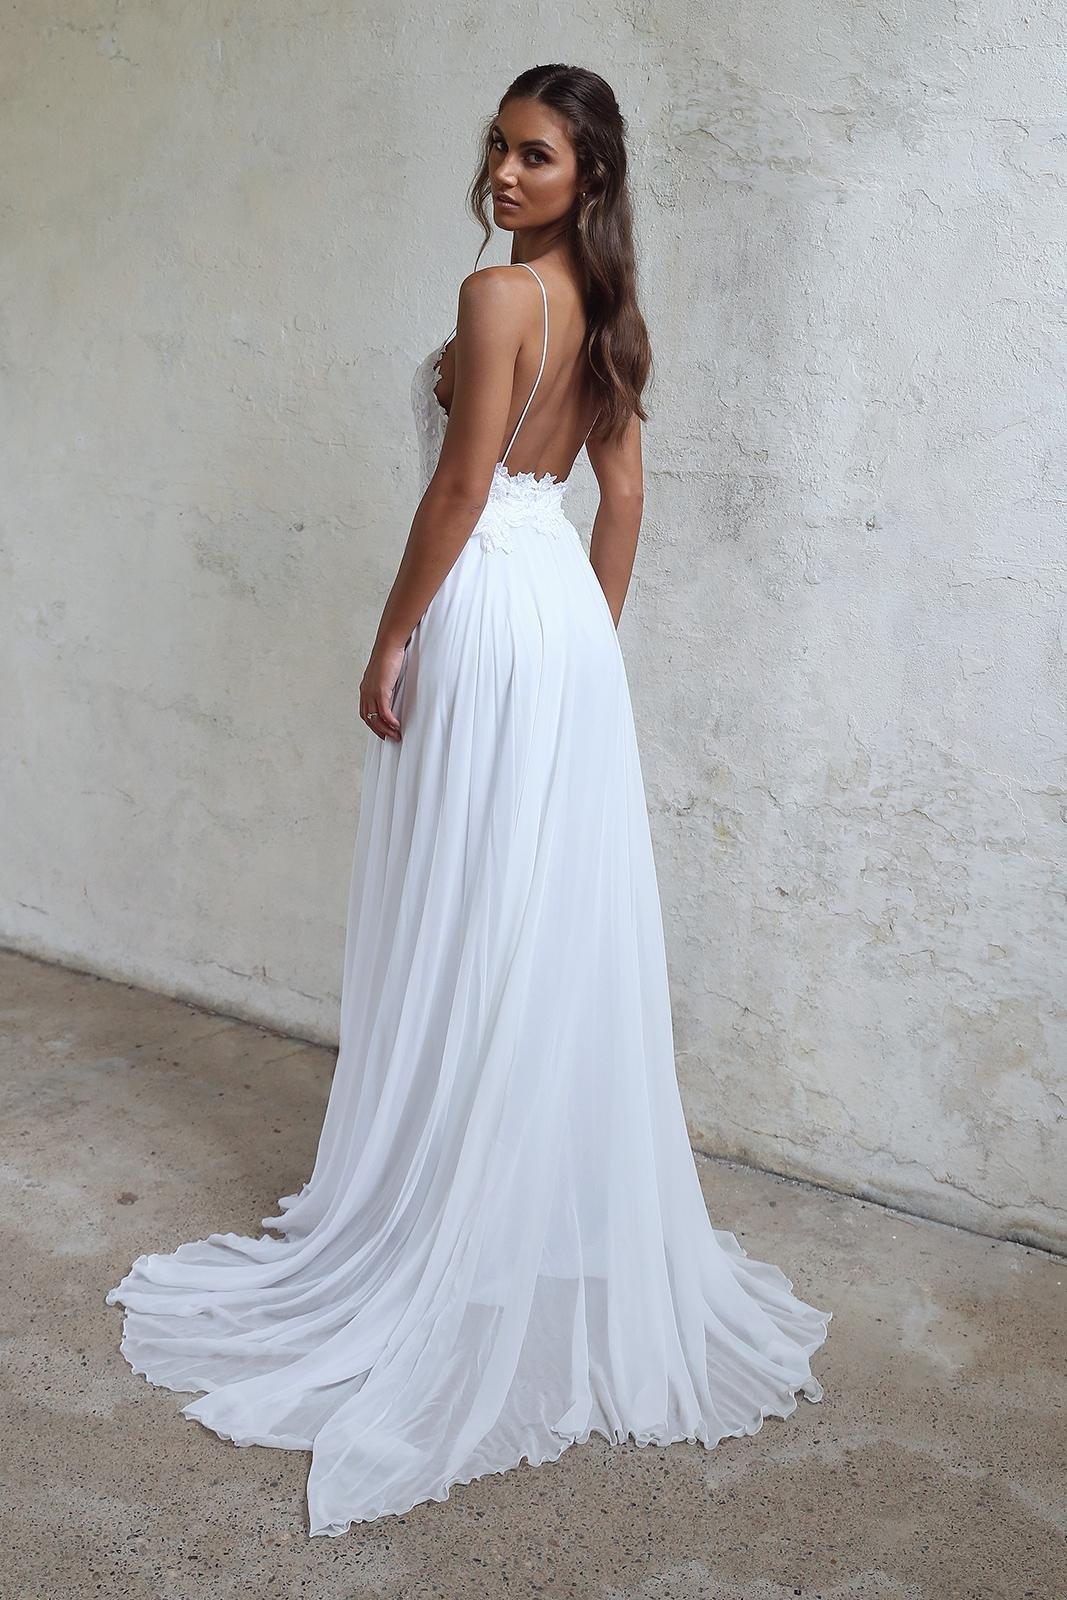 Simple White Lace Spaghetti Straps Wedding Dress,Long Chiffon ...